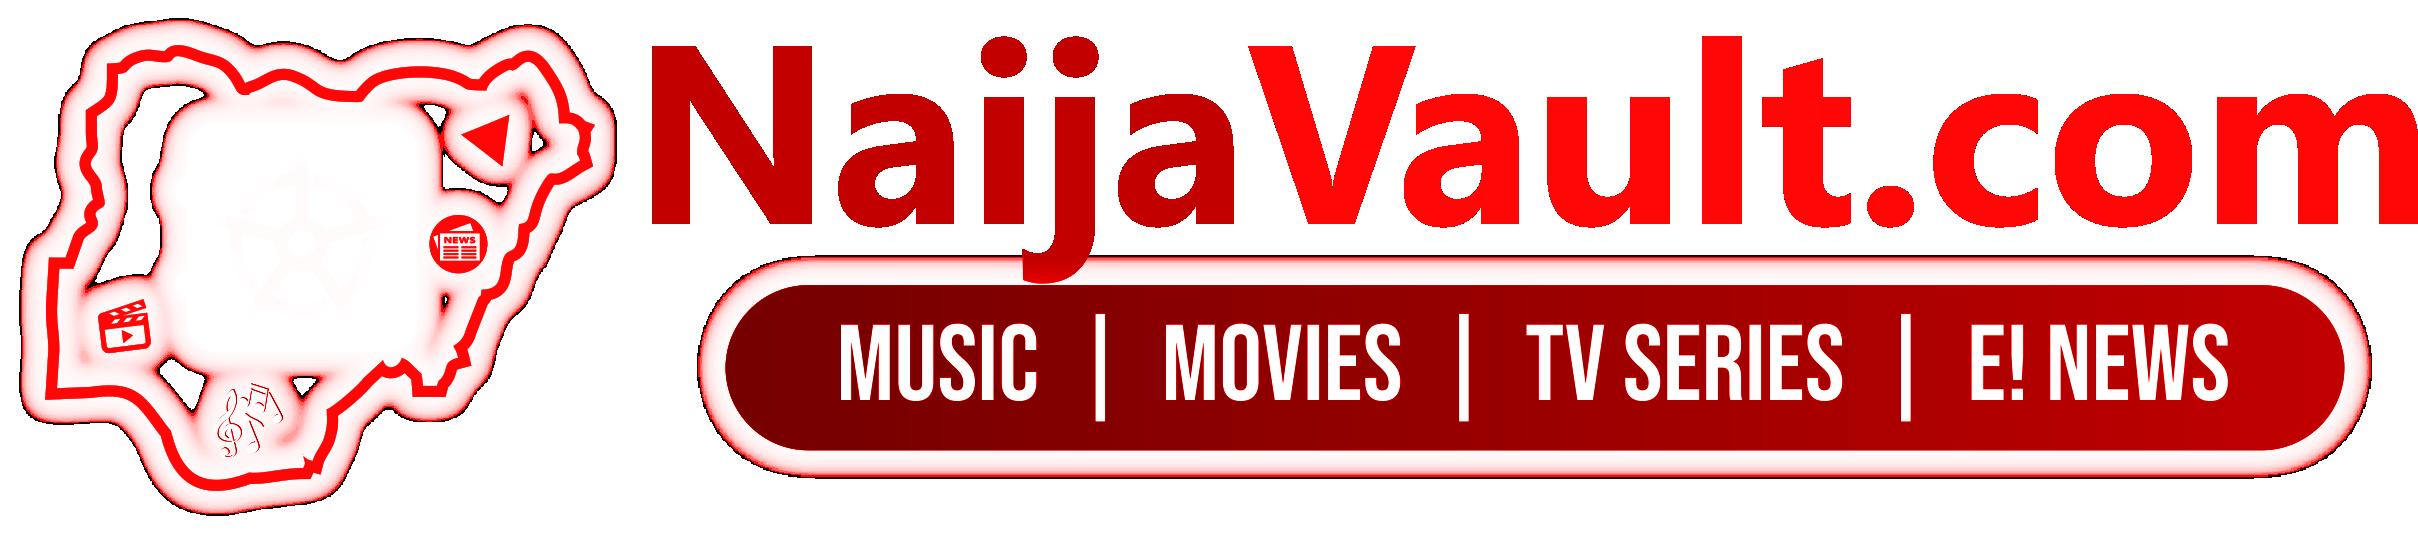 NaijaVault